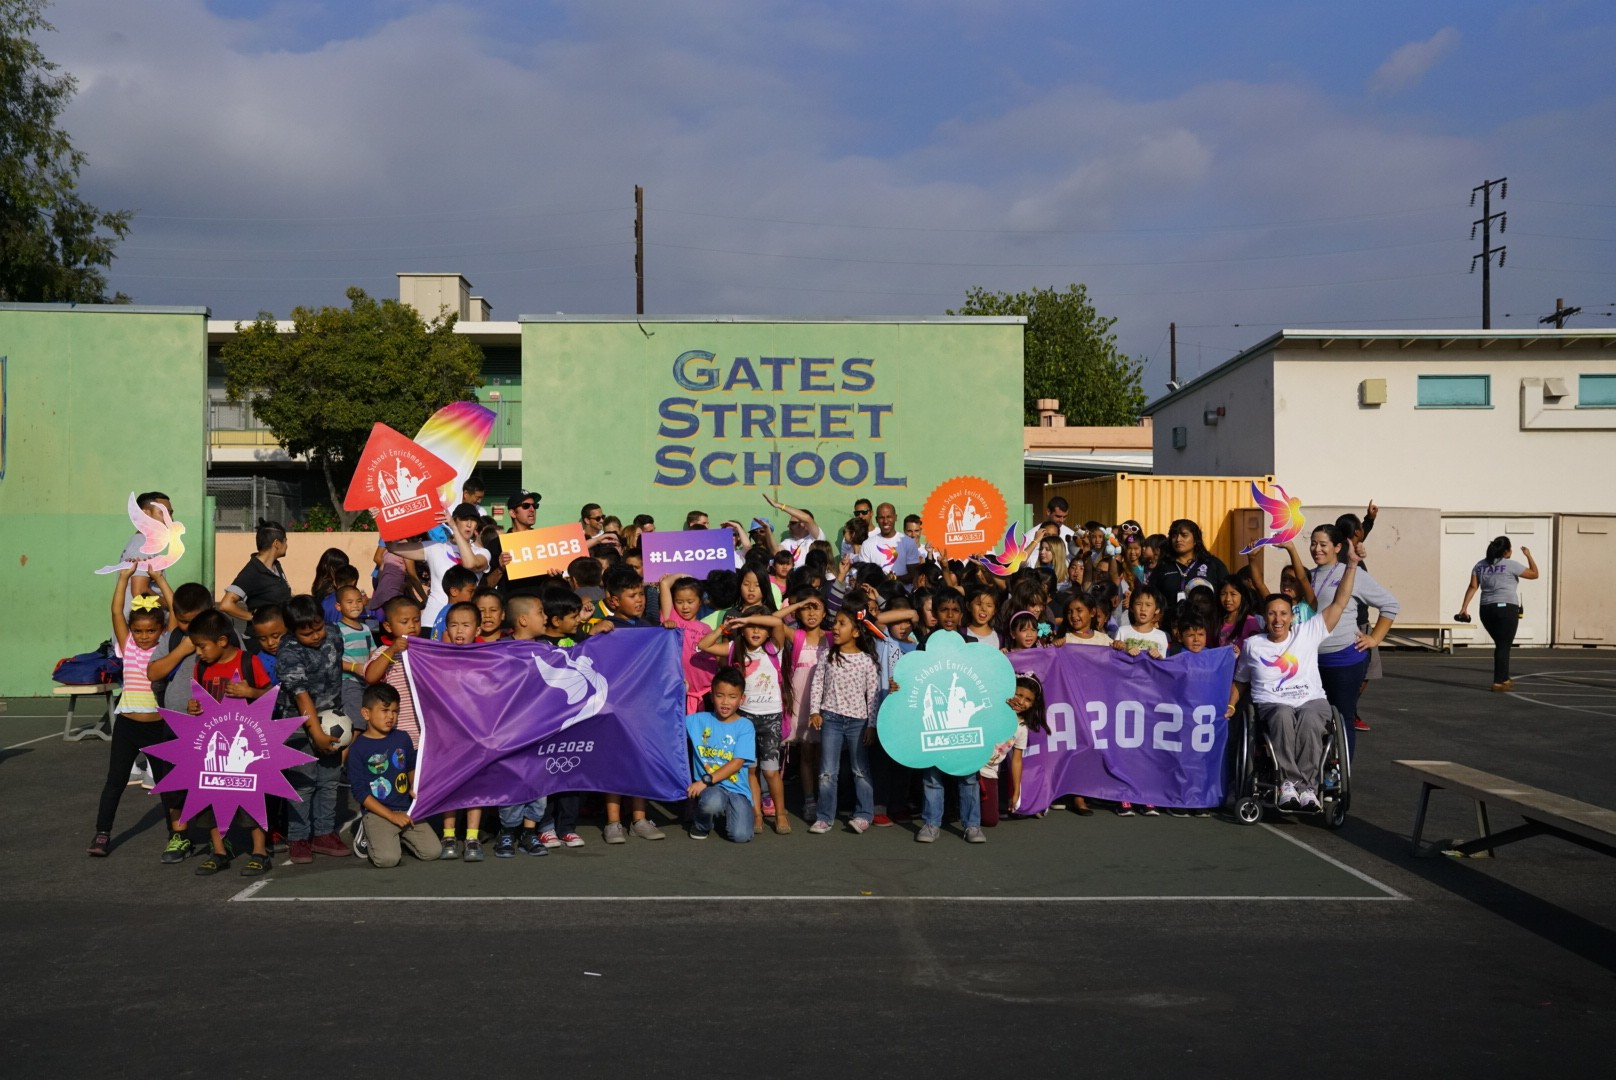 Los Angeles 2028 organisers take part in elementary school sports programme